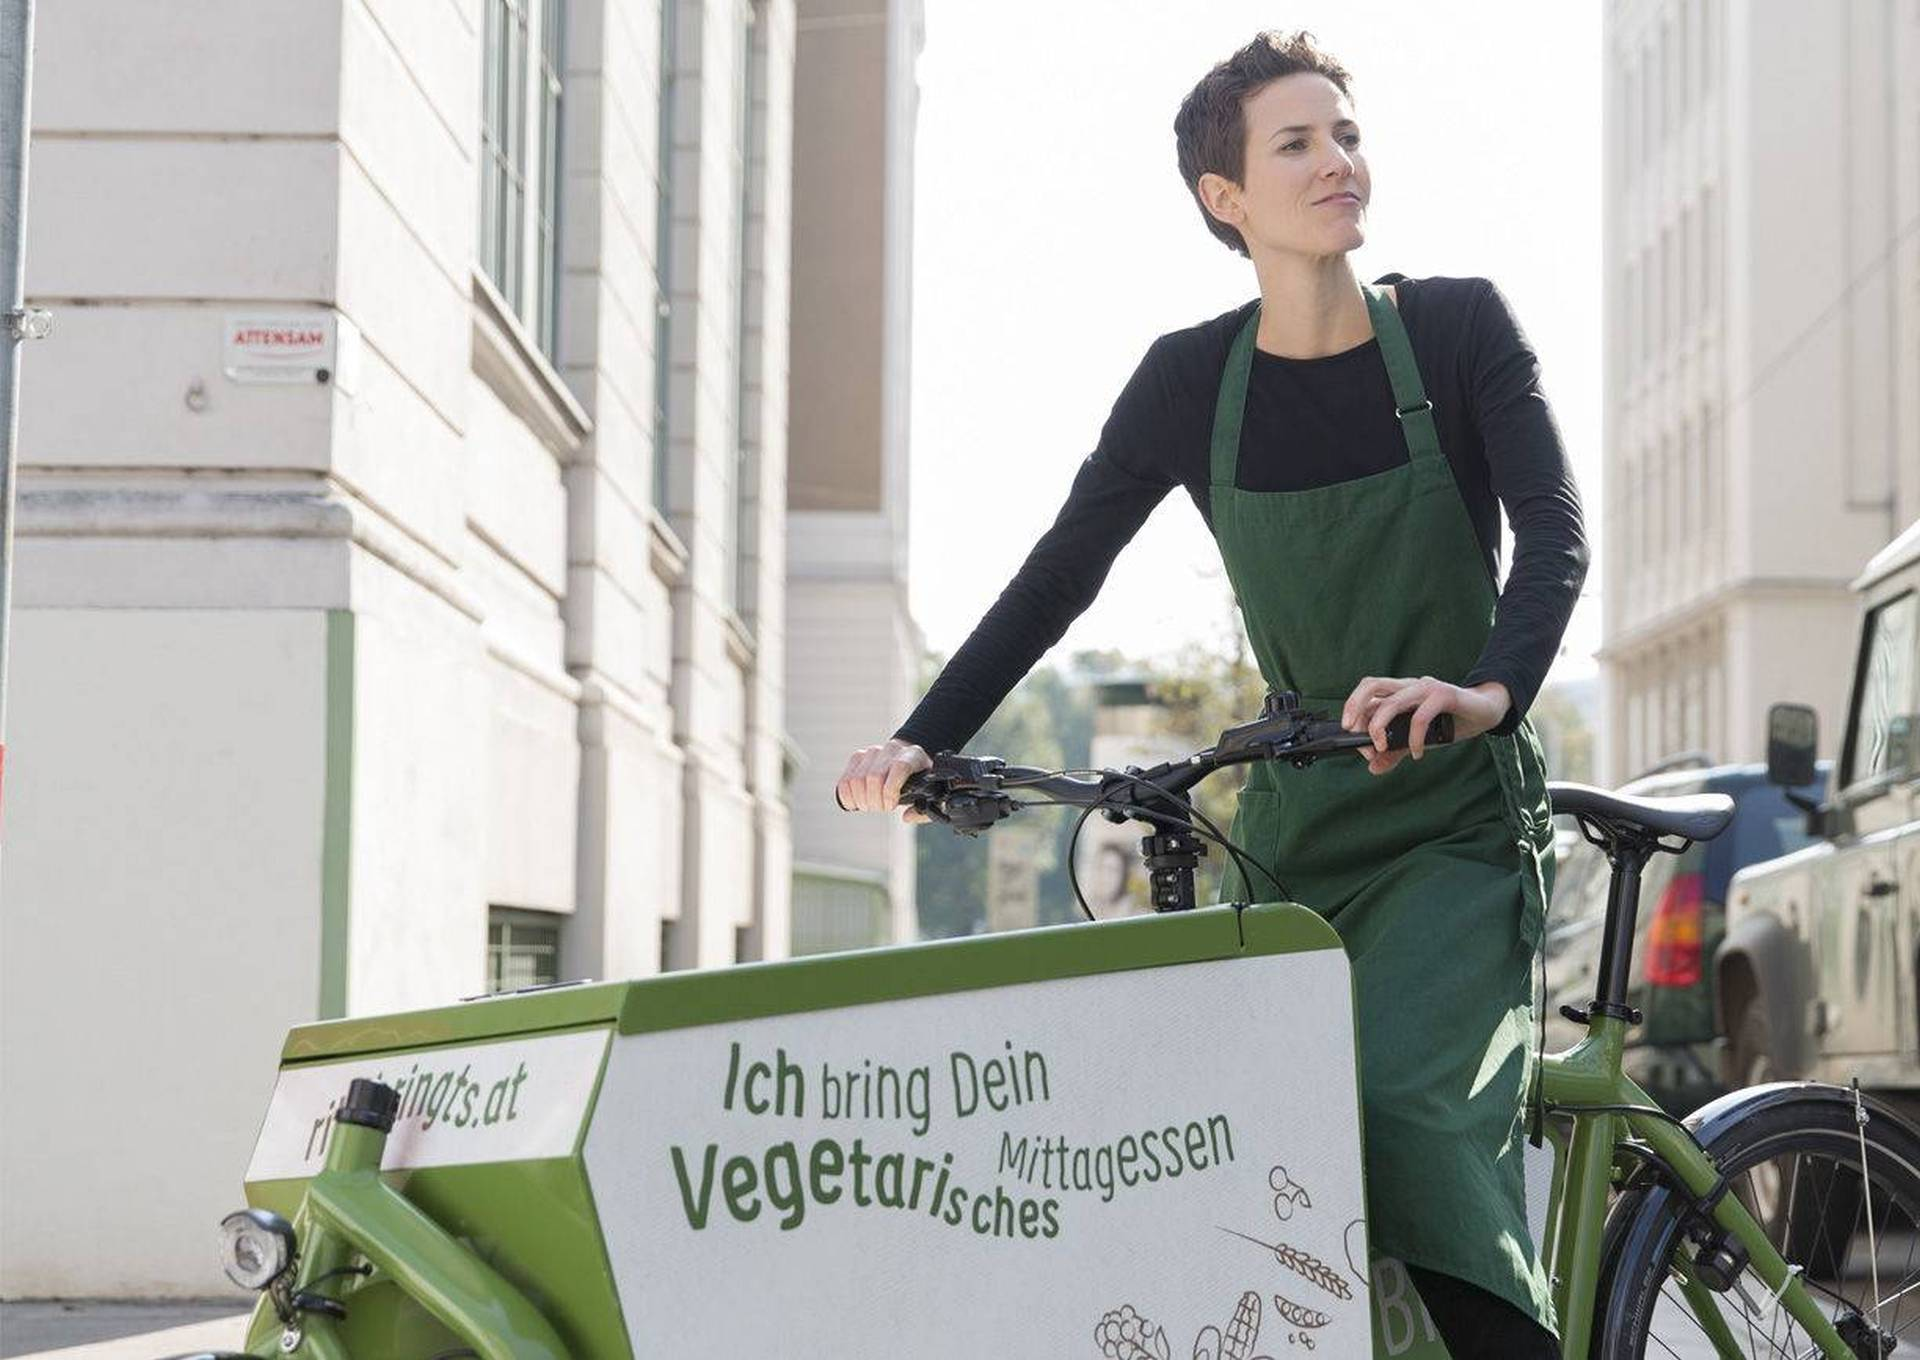 Rita Huber auf einem grünem Transportfahrrad. Foto: ritabringts.at